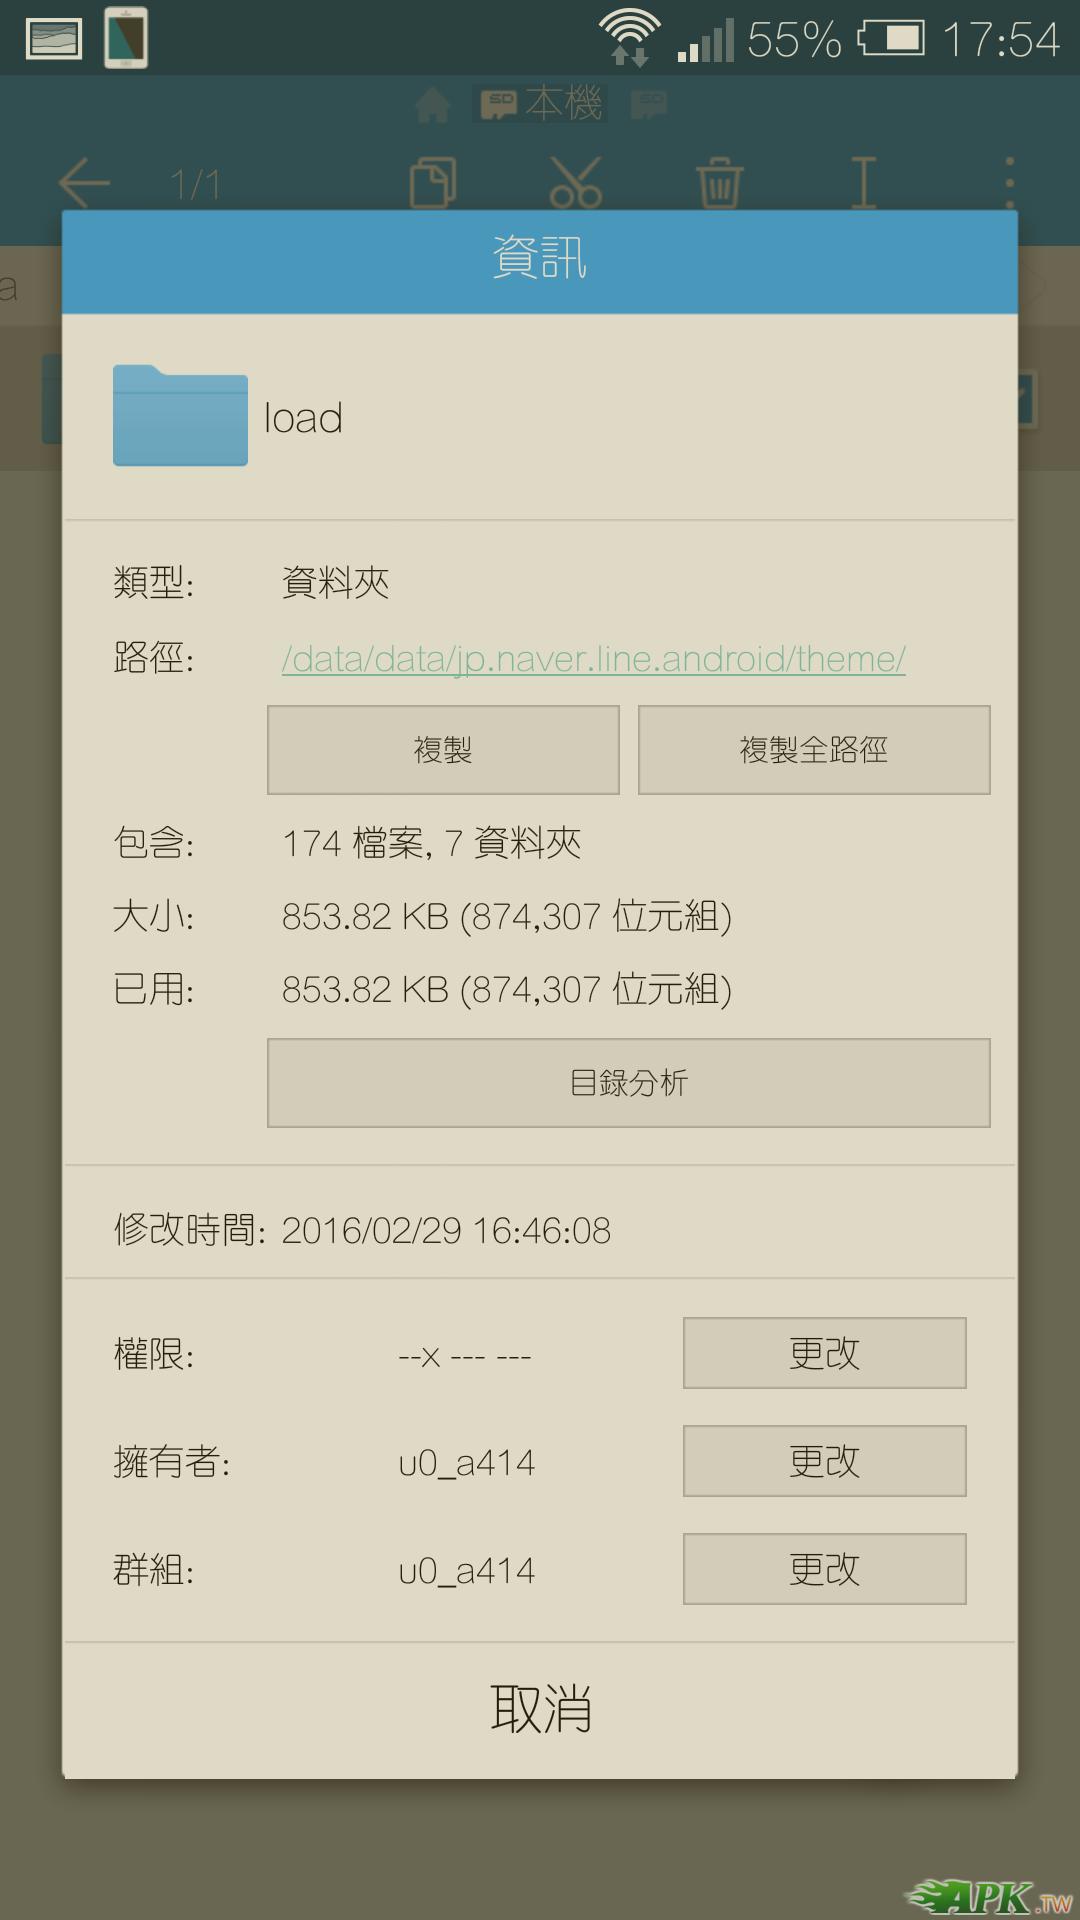 Screenshot_2016-03-01-17-54-14.png